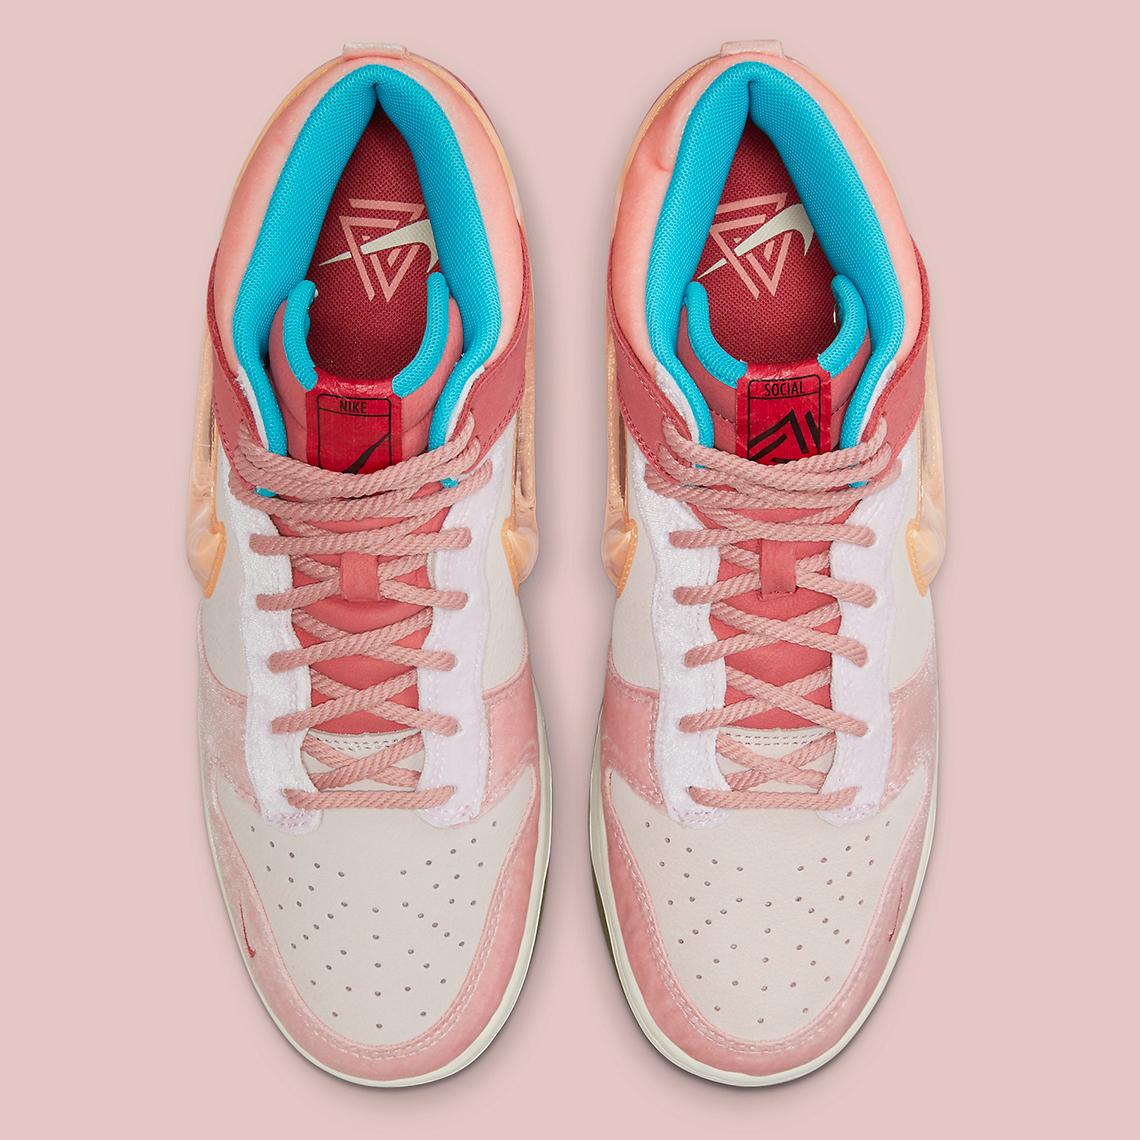 Social Status Nike Dunk Mid DJ1173 600 6